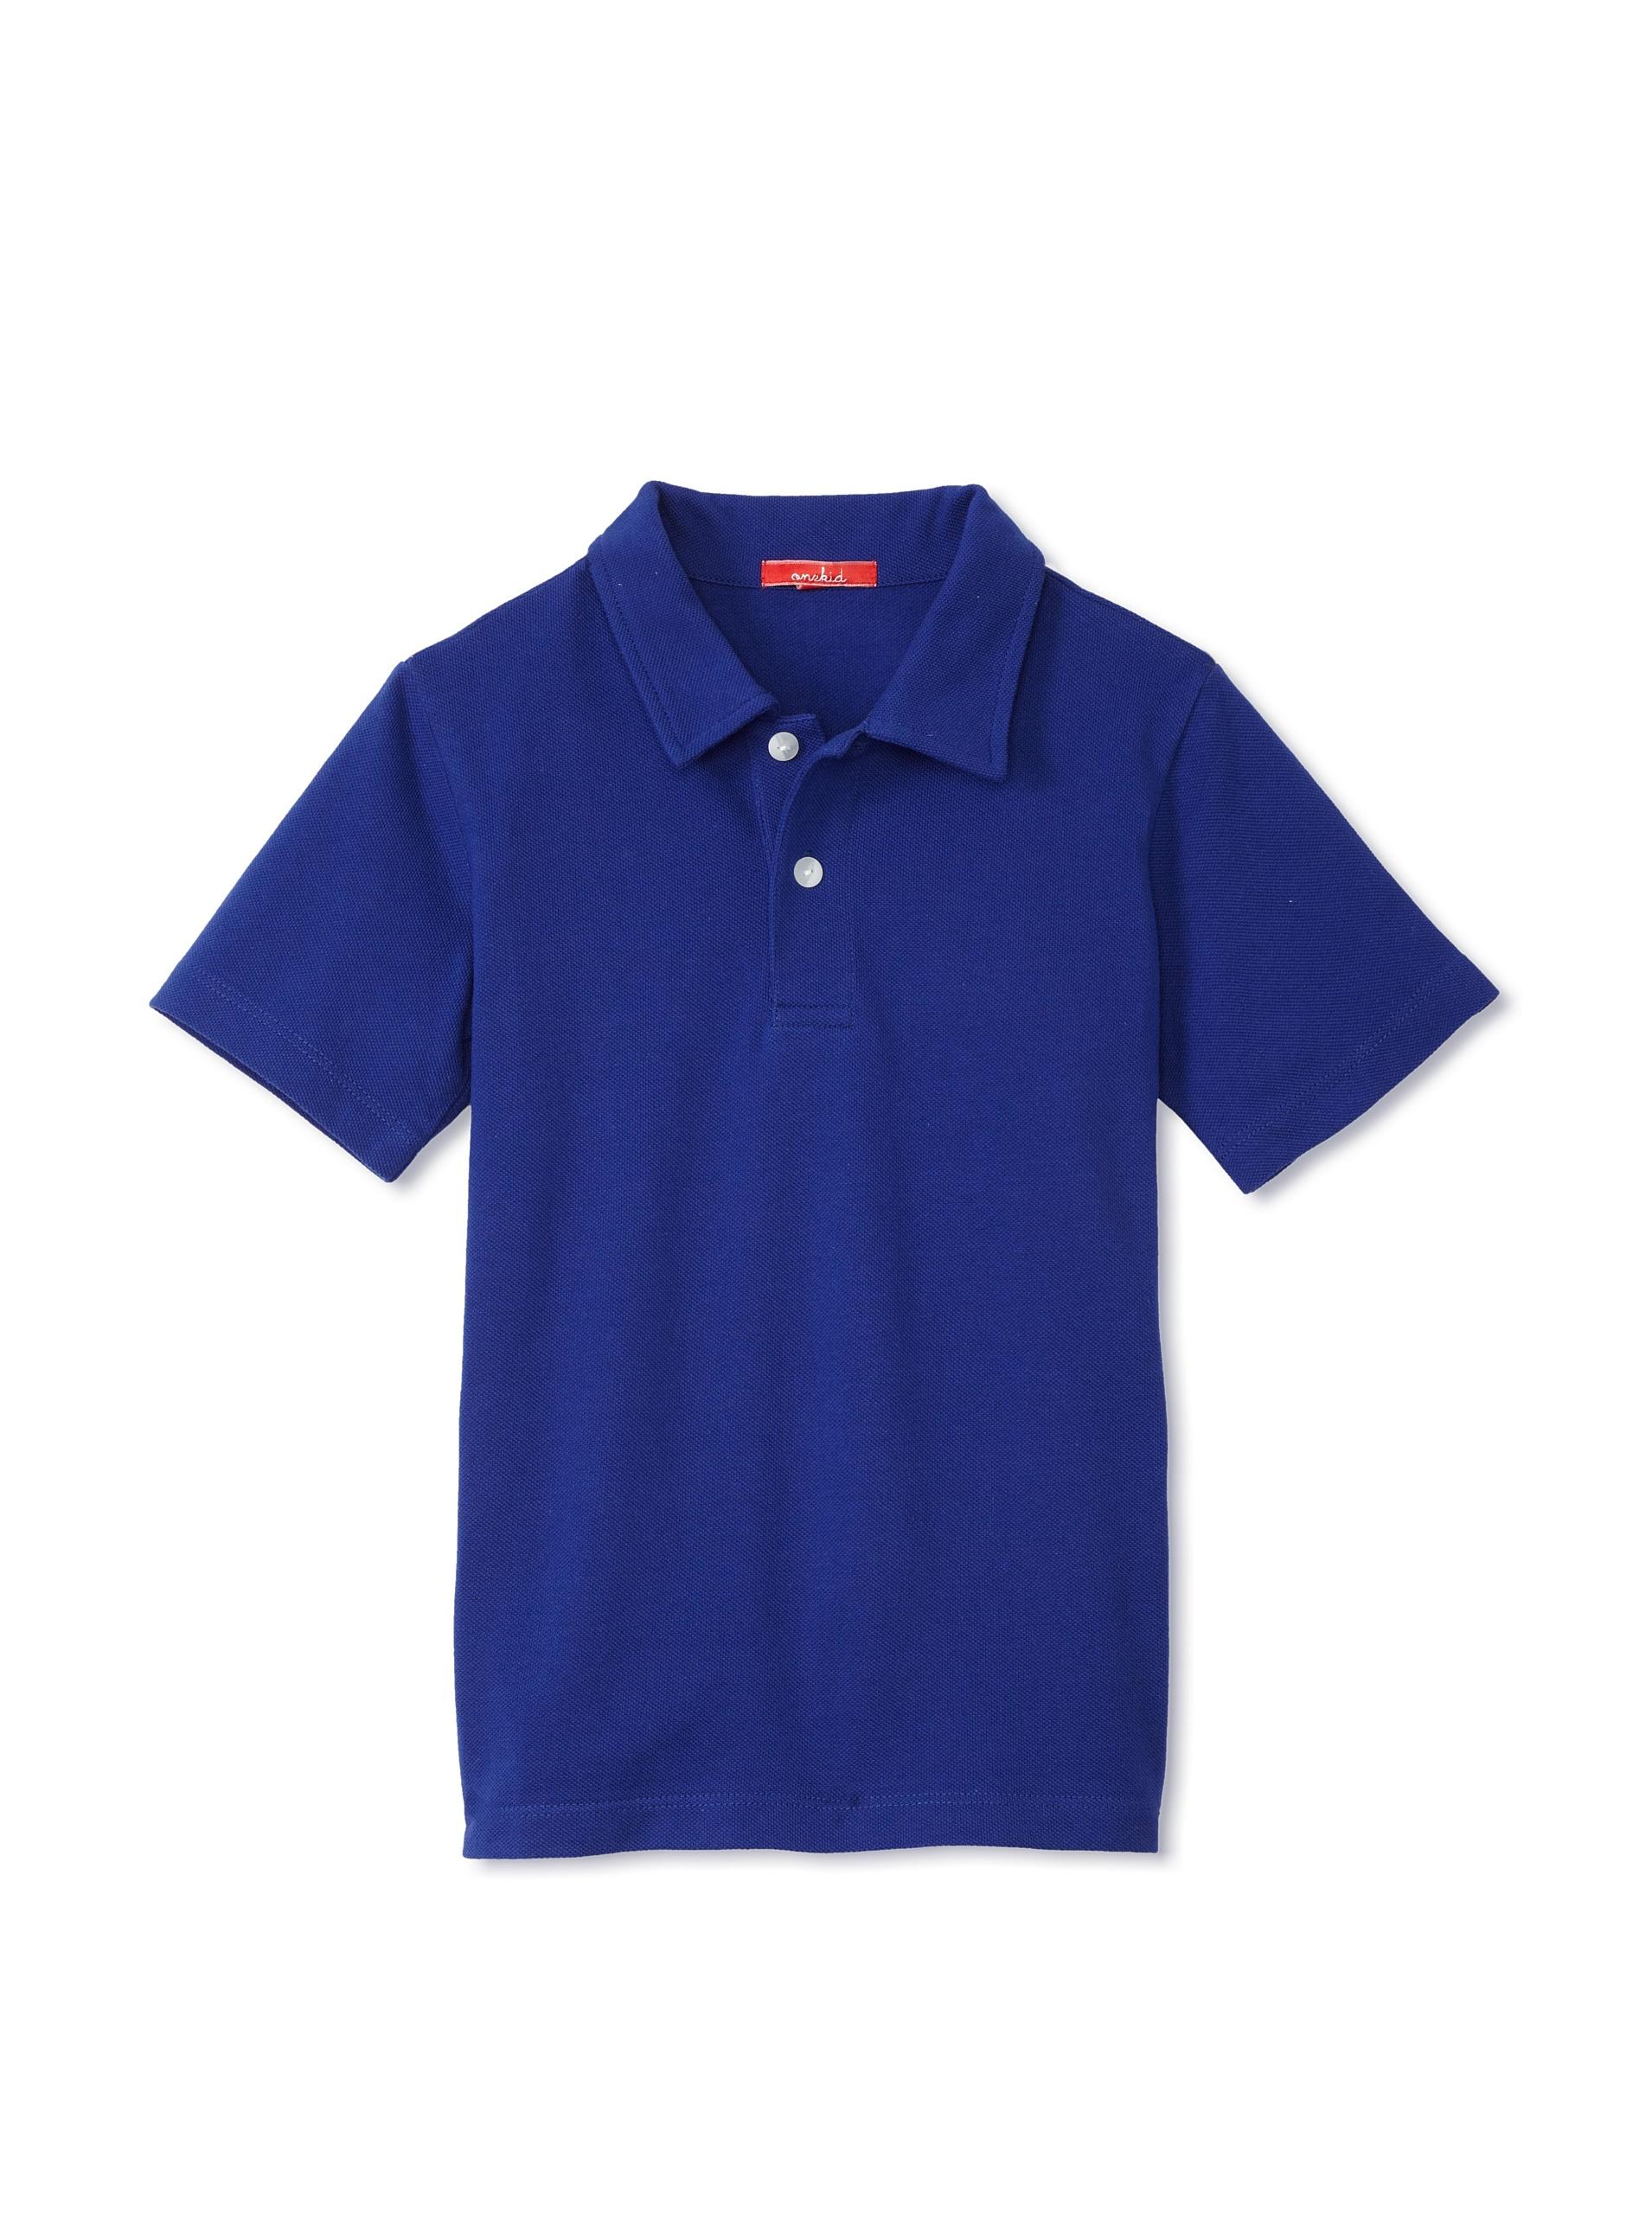 One Kid Boy's Polo Shirt (Cadet)